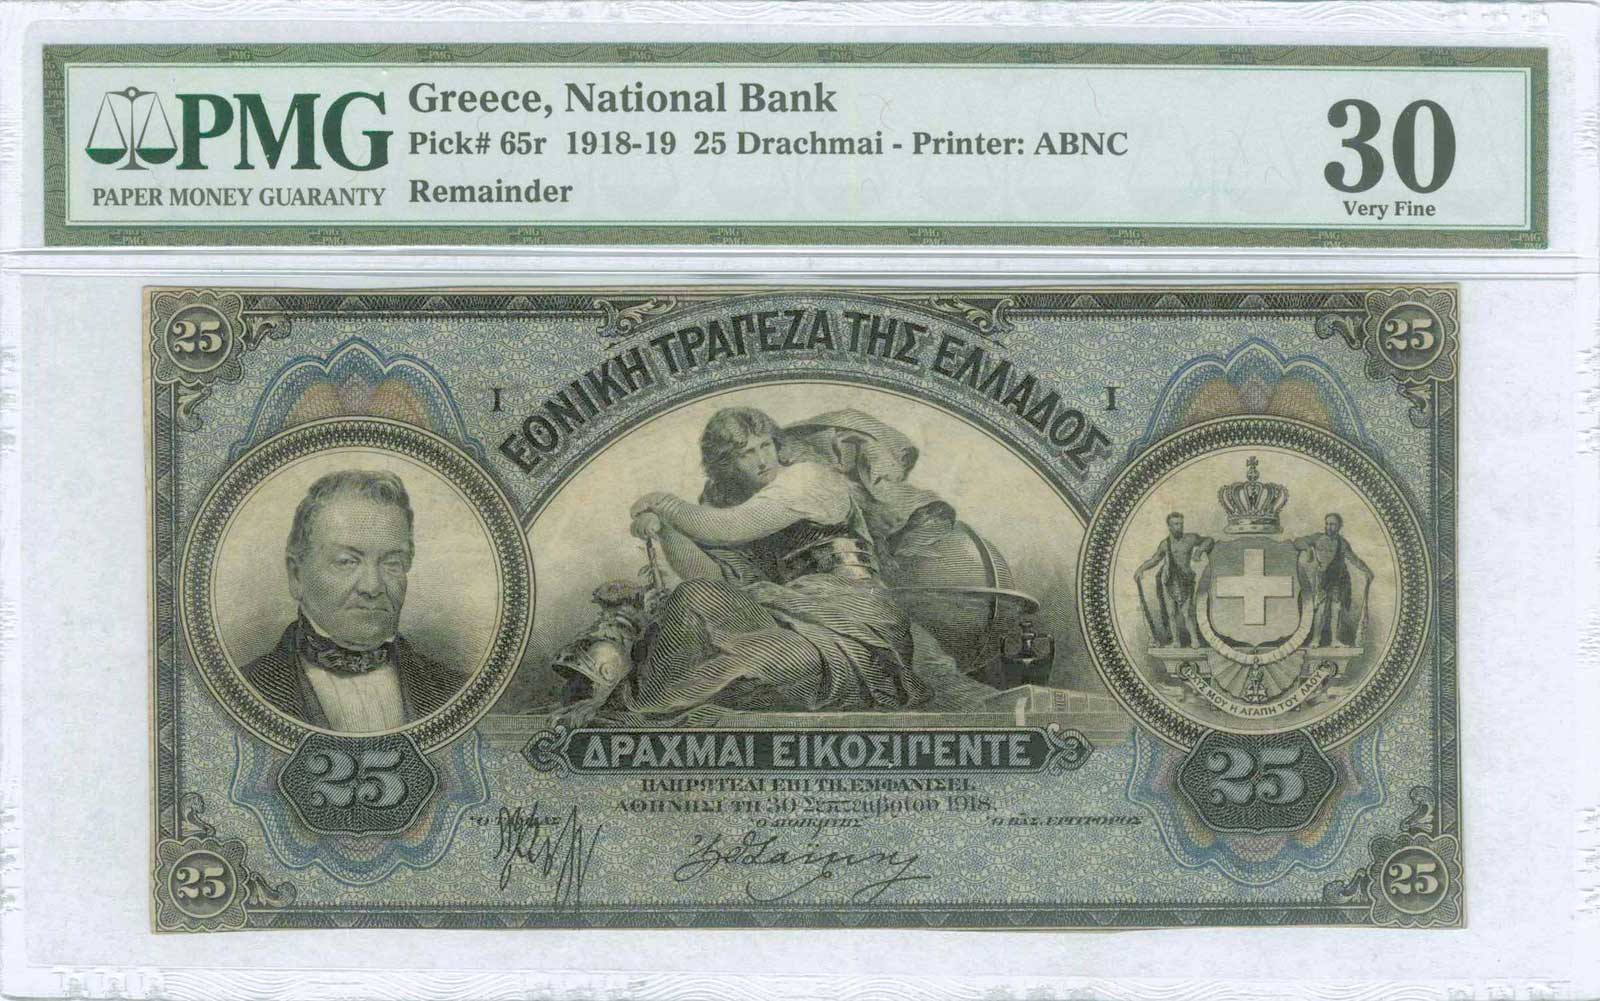 Lot 9270 - GREECE-  PAPER MONEY - BANKNOTES National Bank of Greece -  A. Karamitsos Public & LIVE Bid Auction 610 Coins, Medals & Banknotes